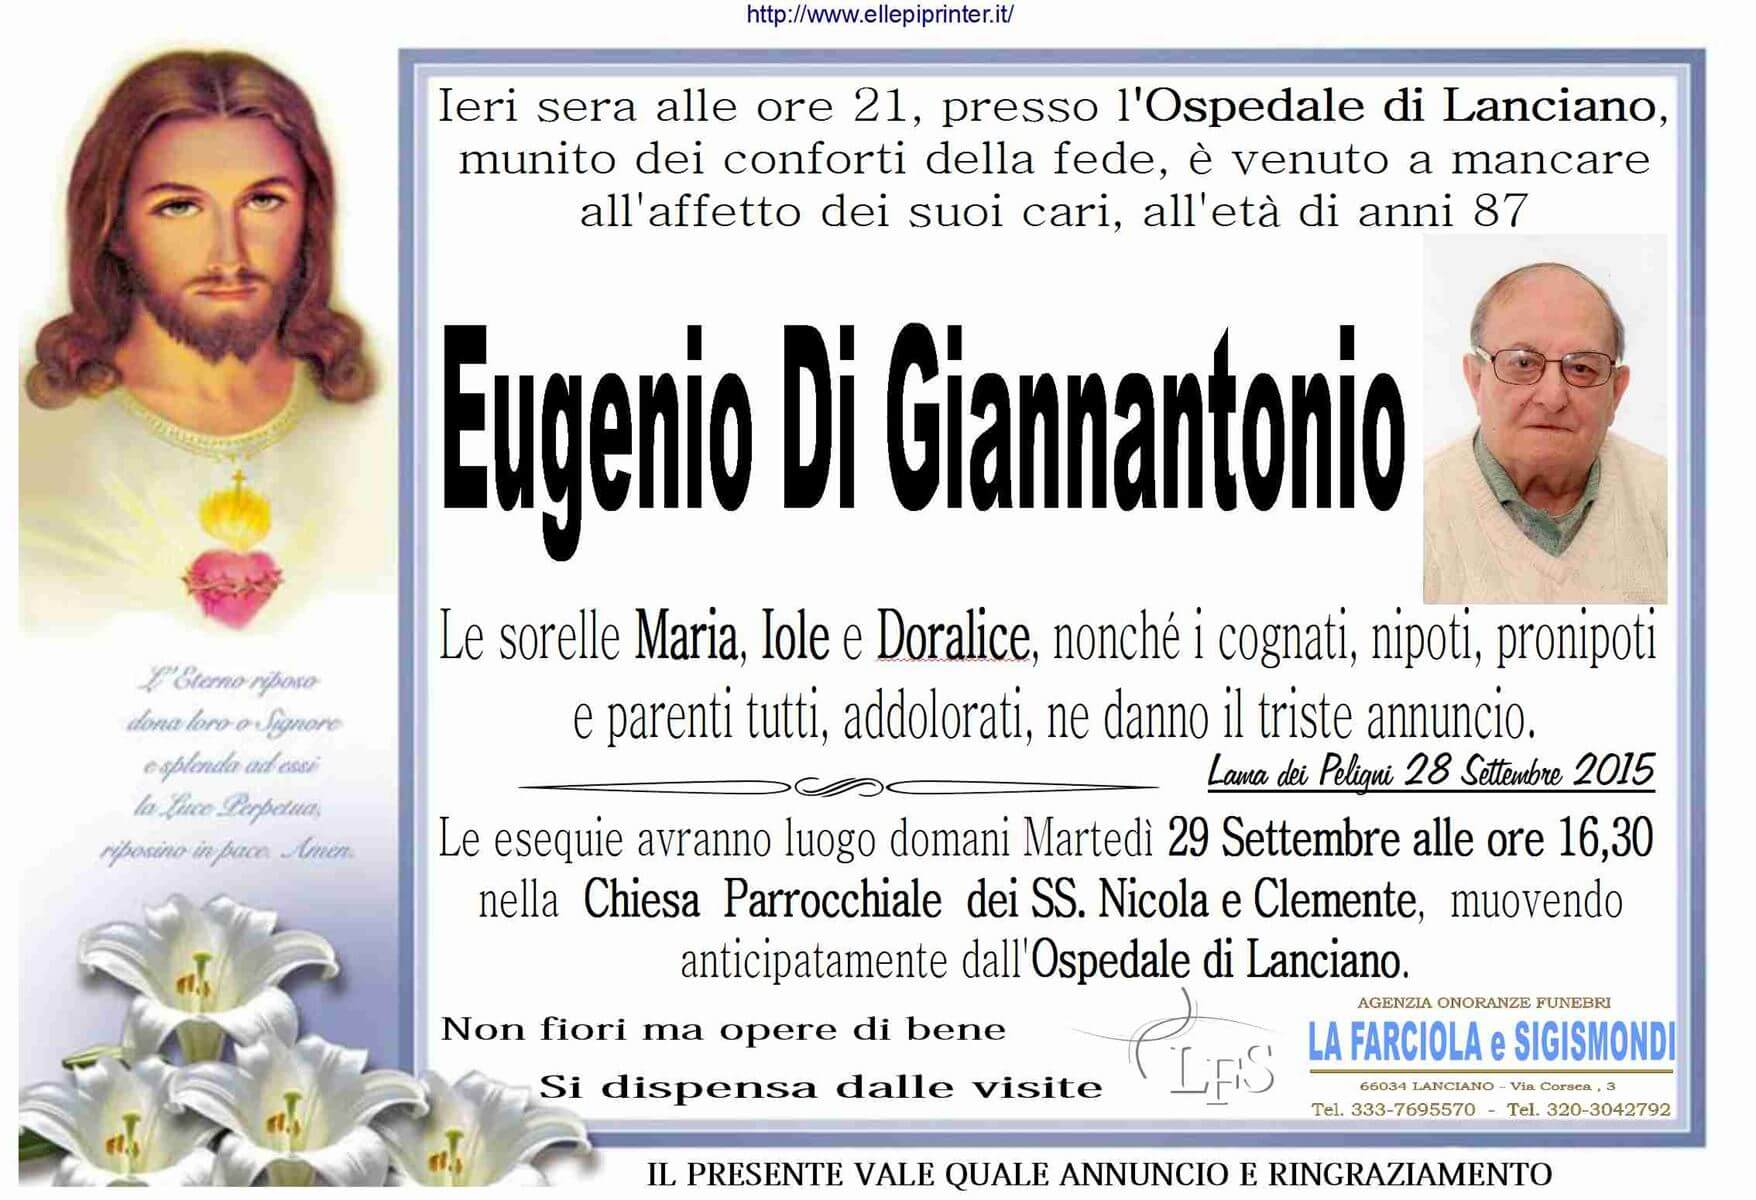 MANIFESTO DI GIANNANTONIO